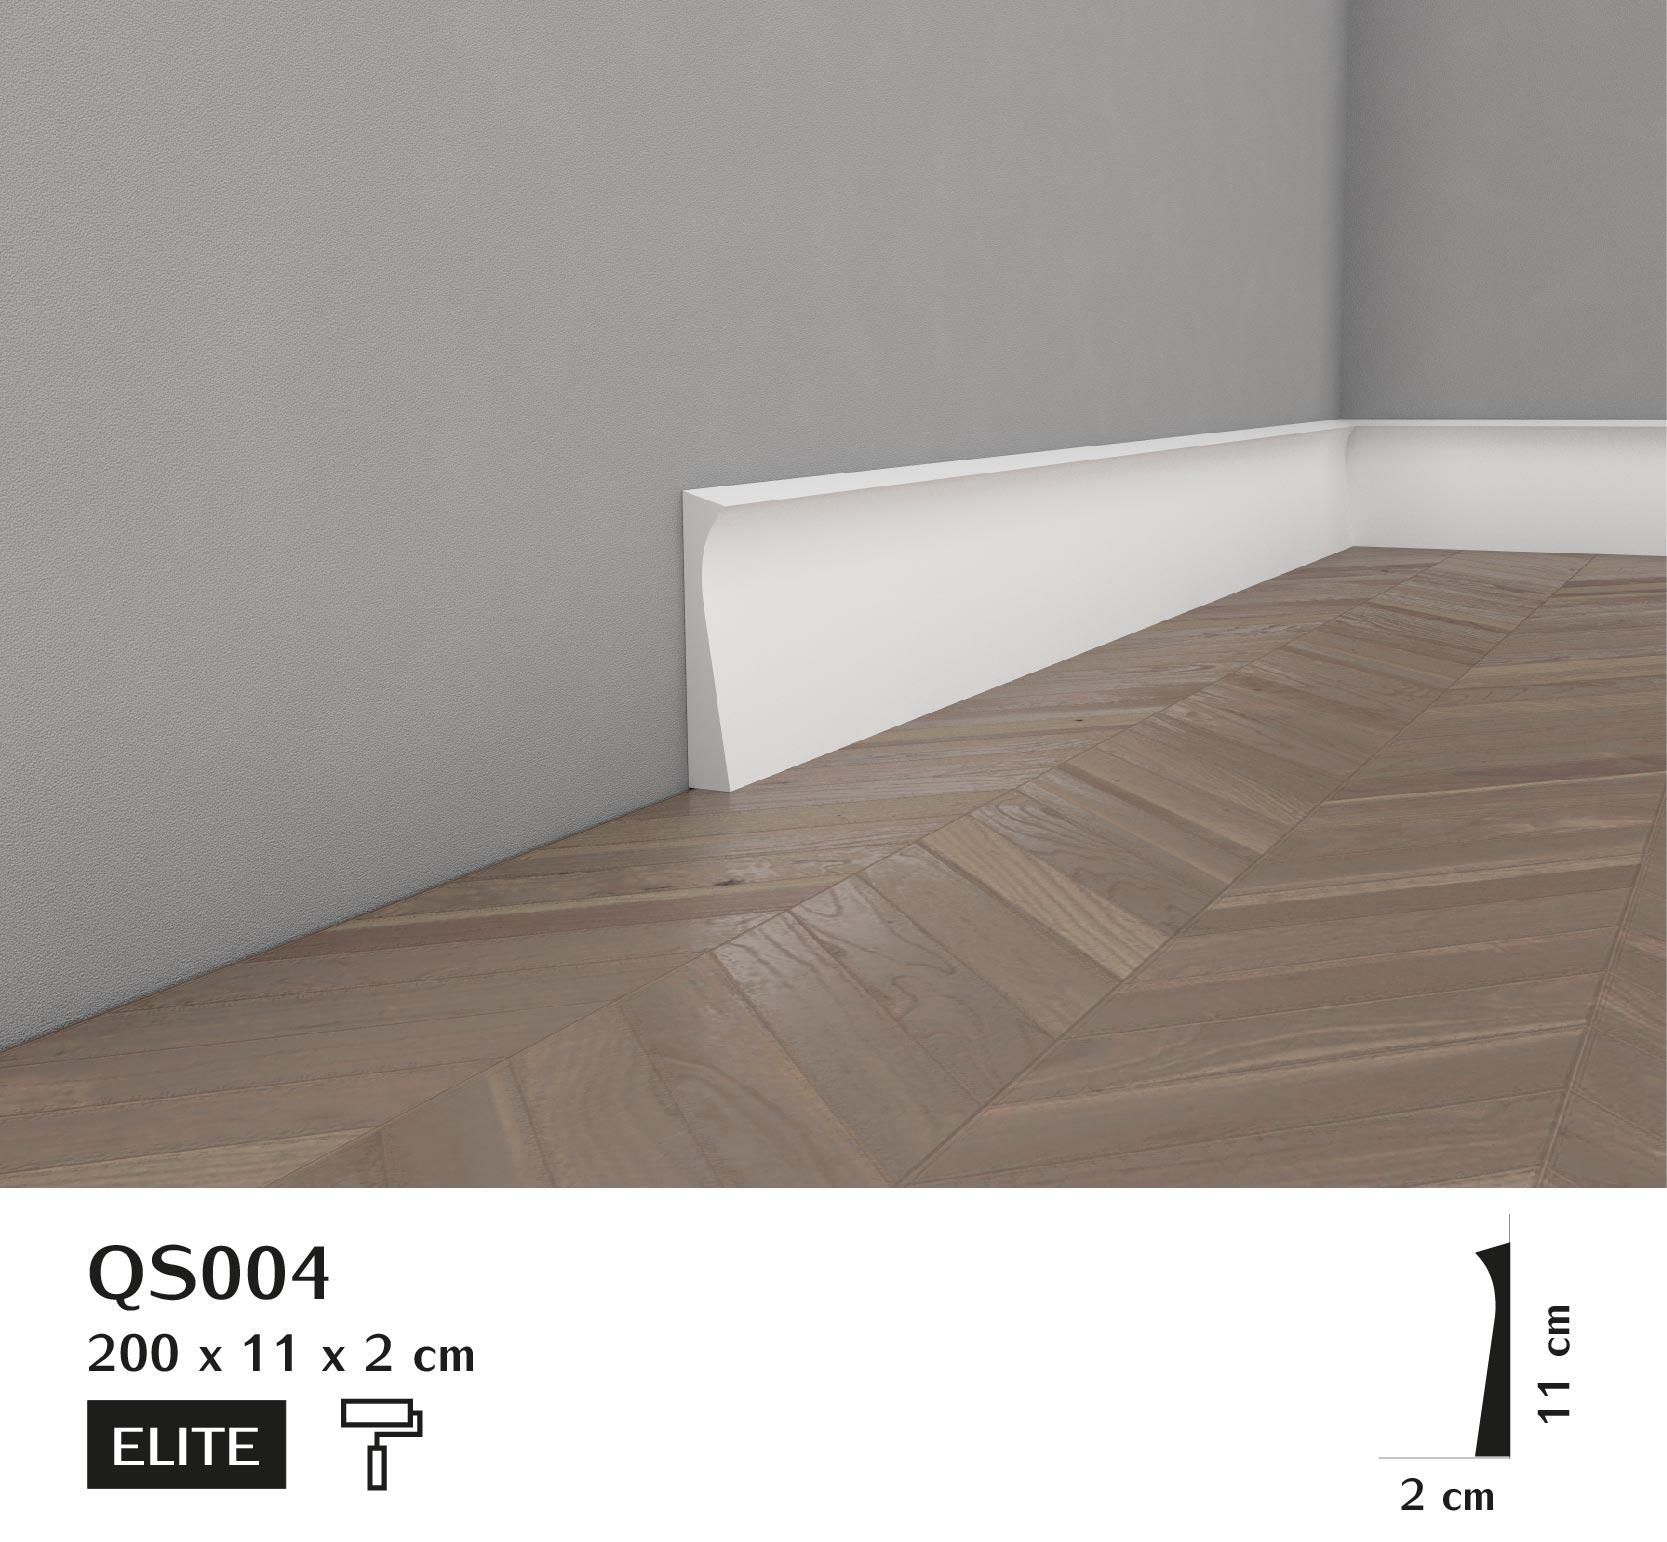 Qs004